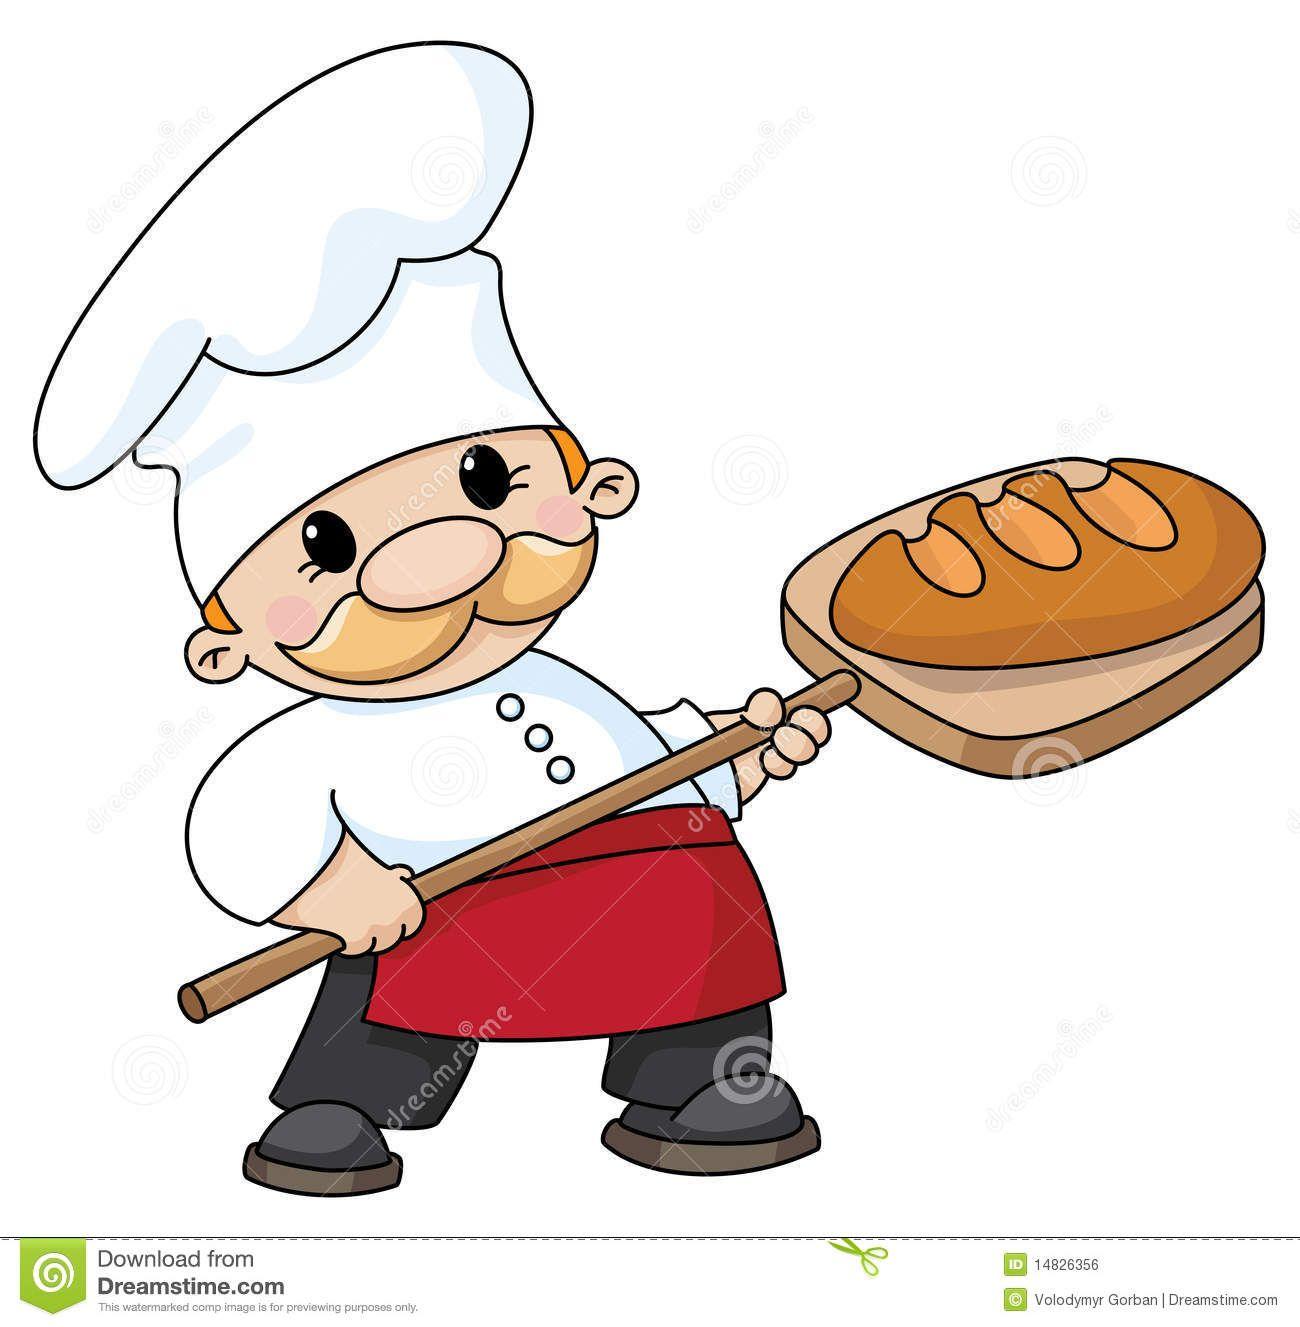 Baker clipart panadero. Mostrando un gran pan